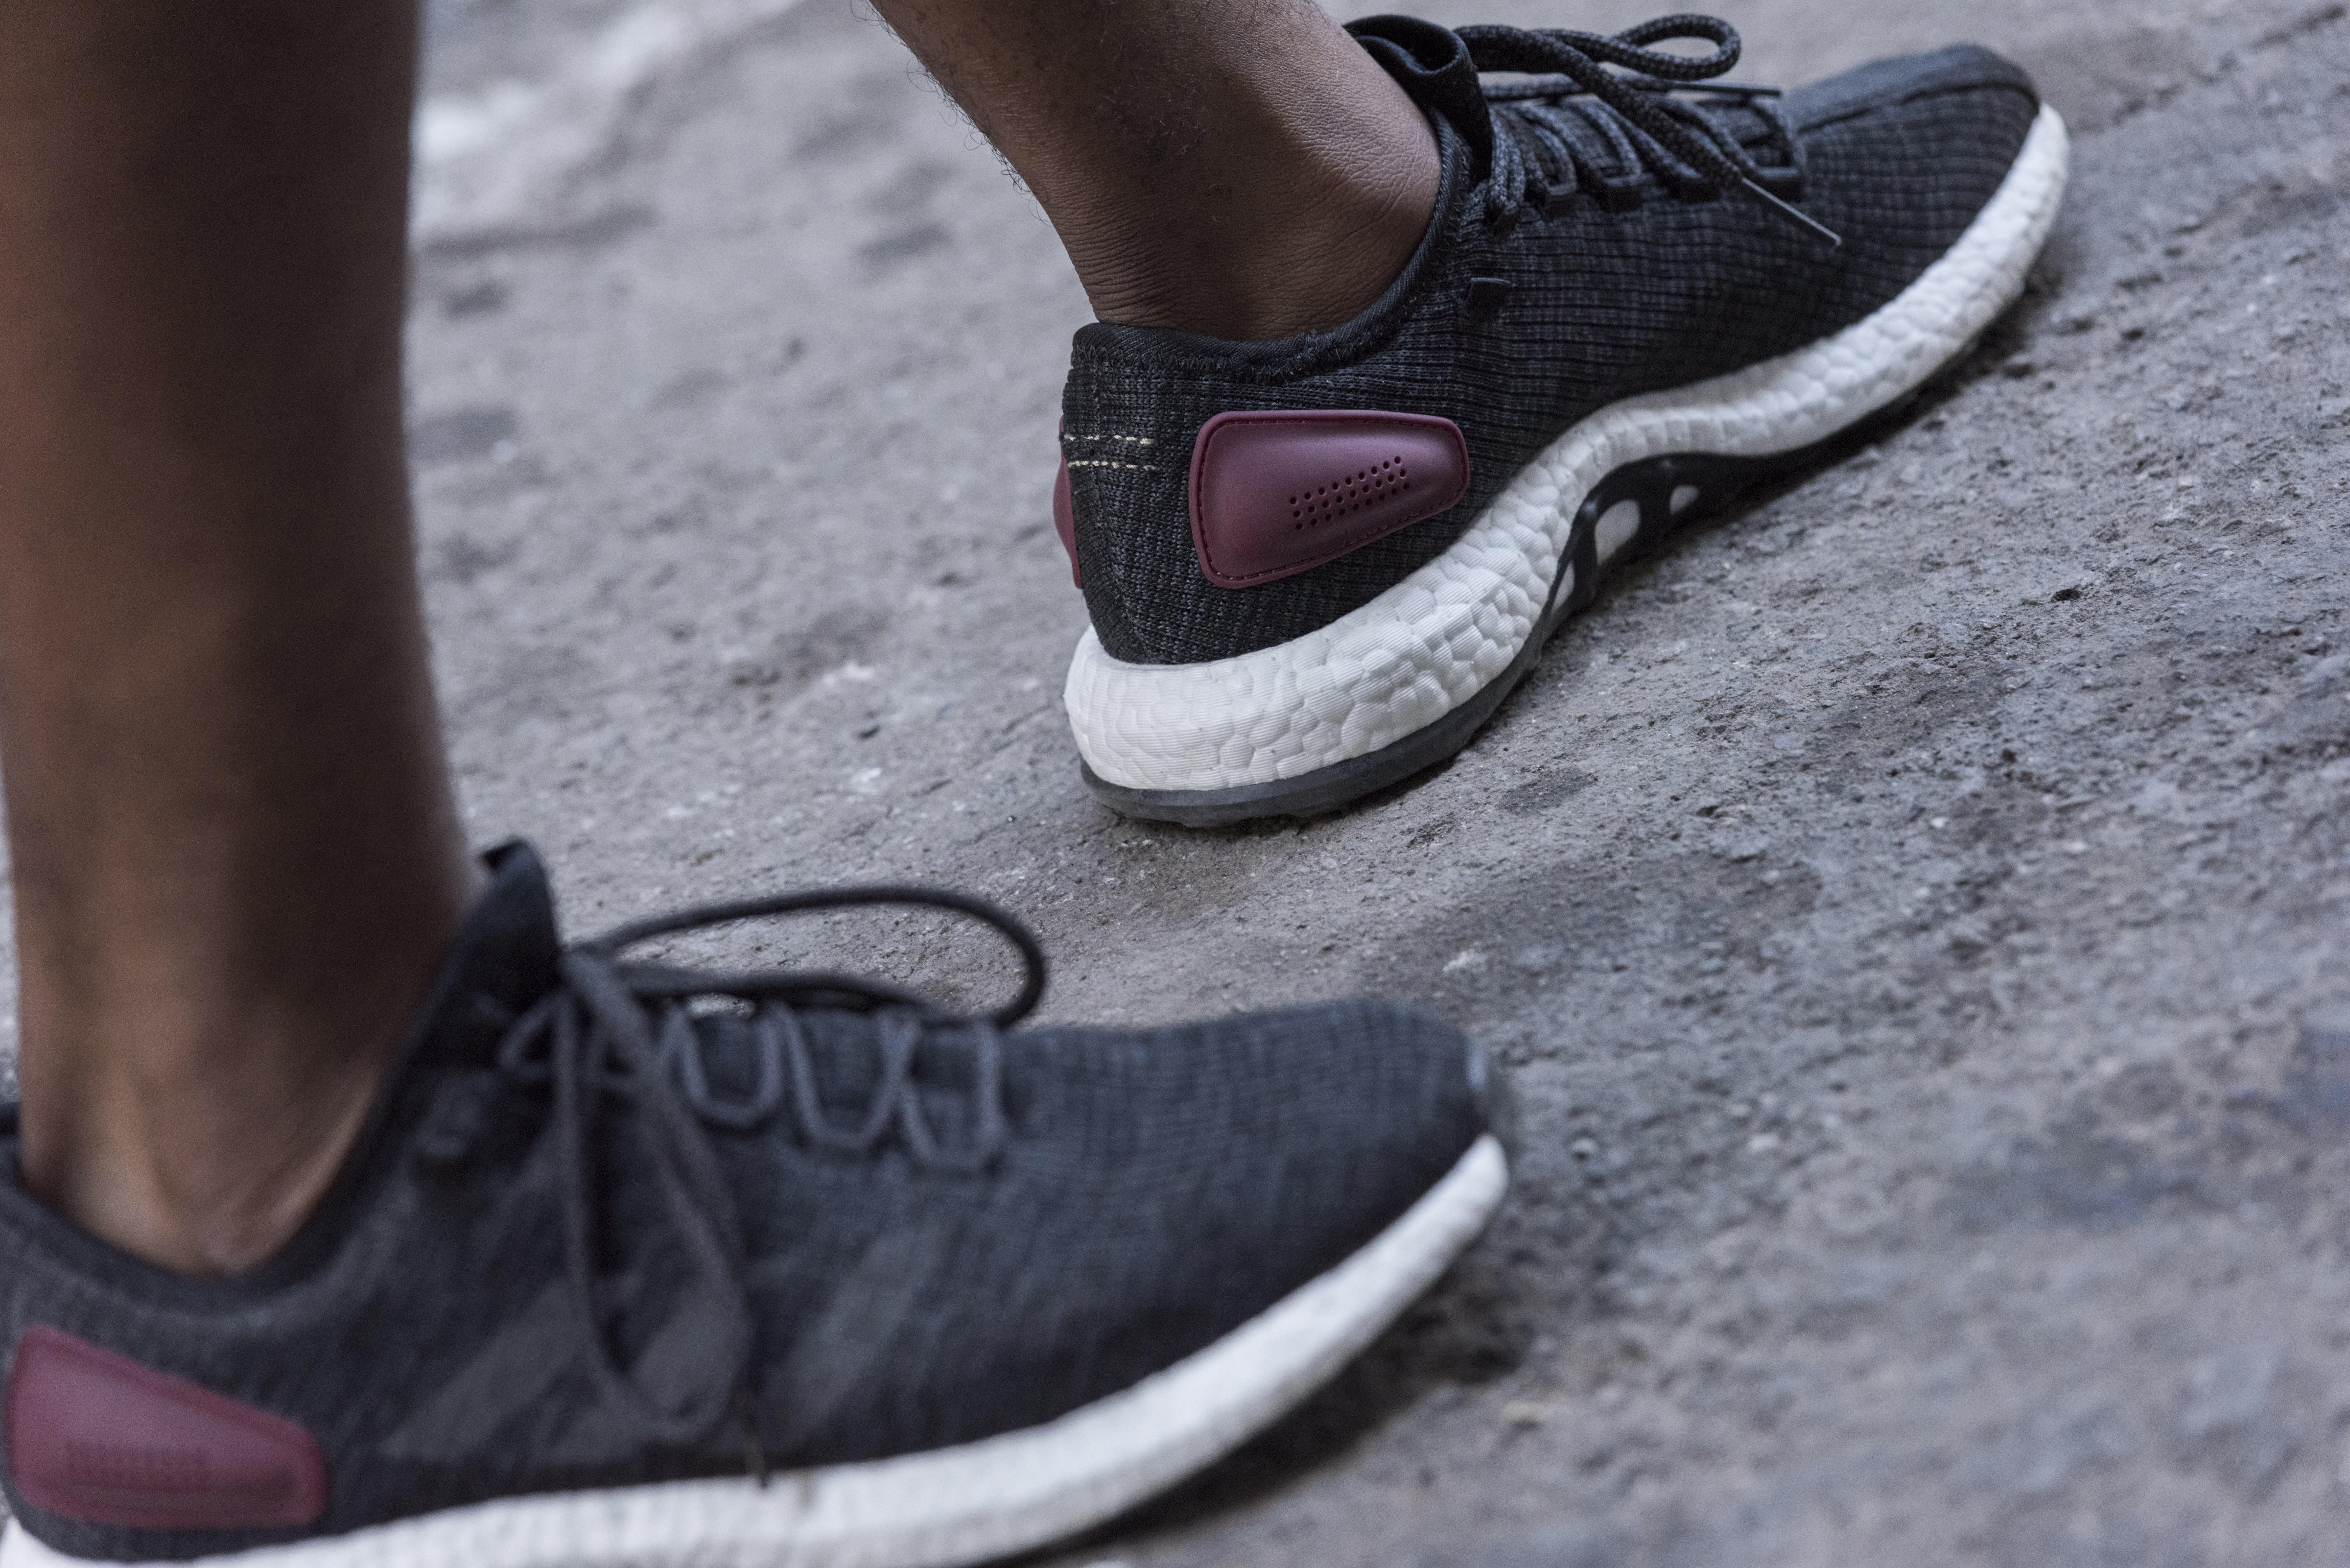 Adidas Pure Boost Primeknit Release